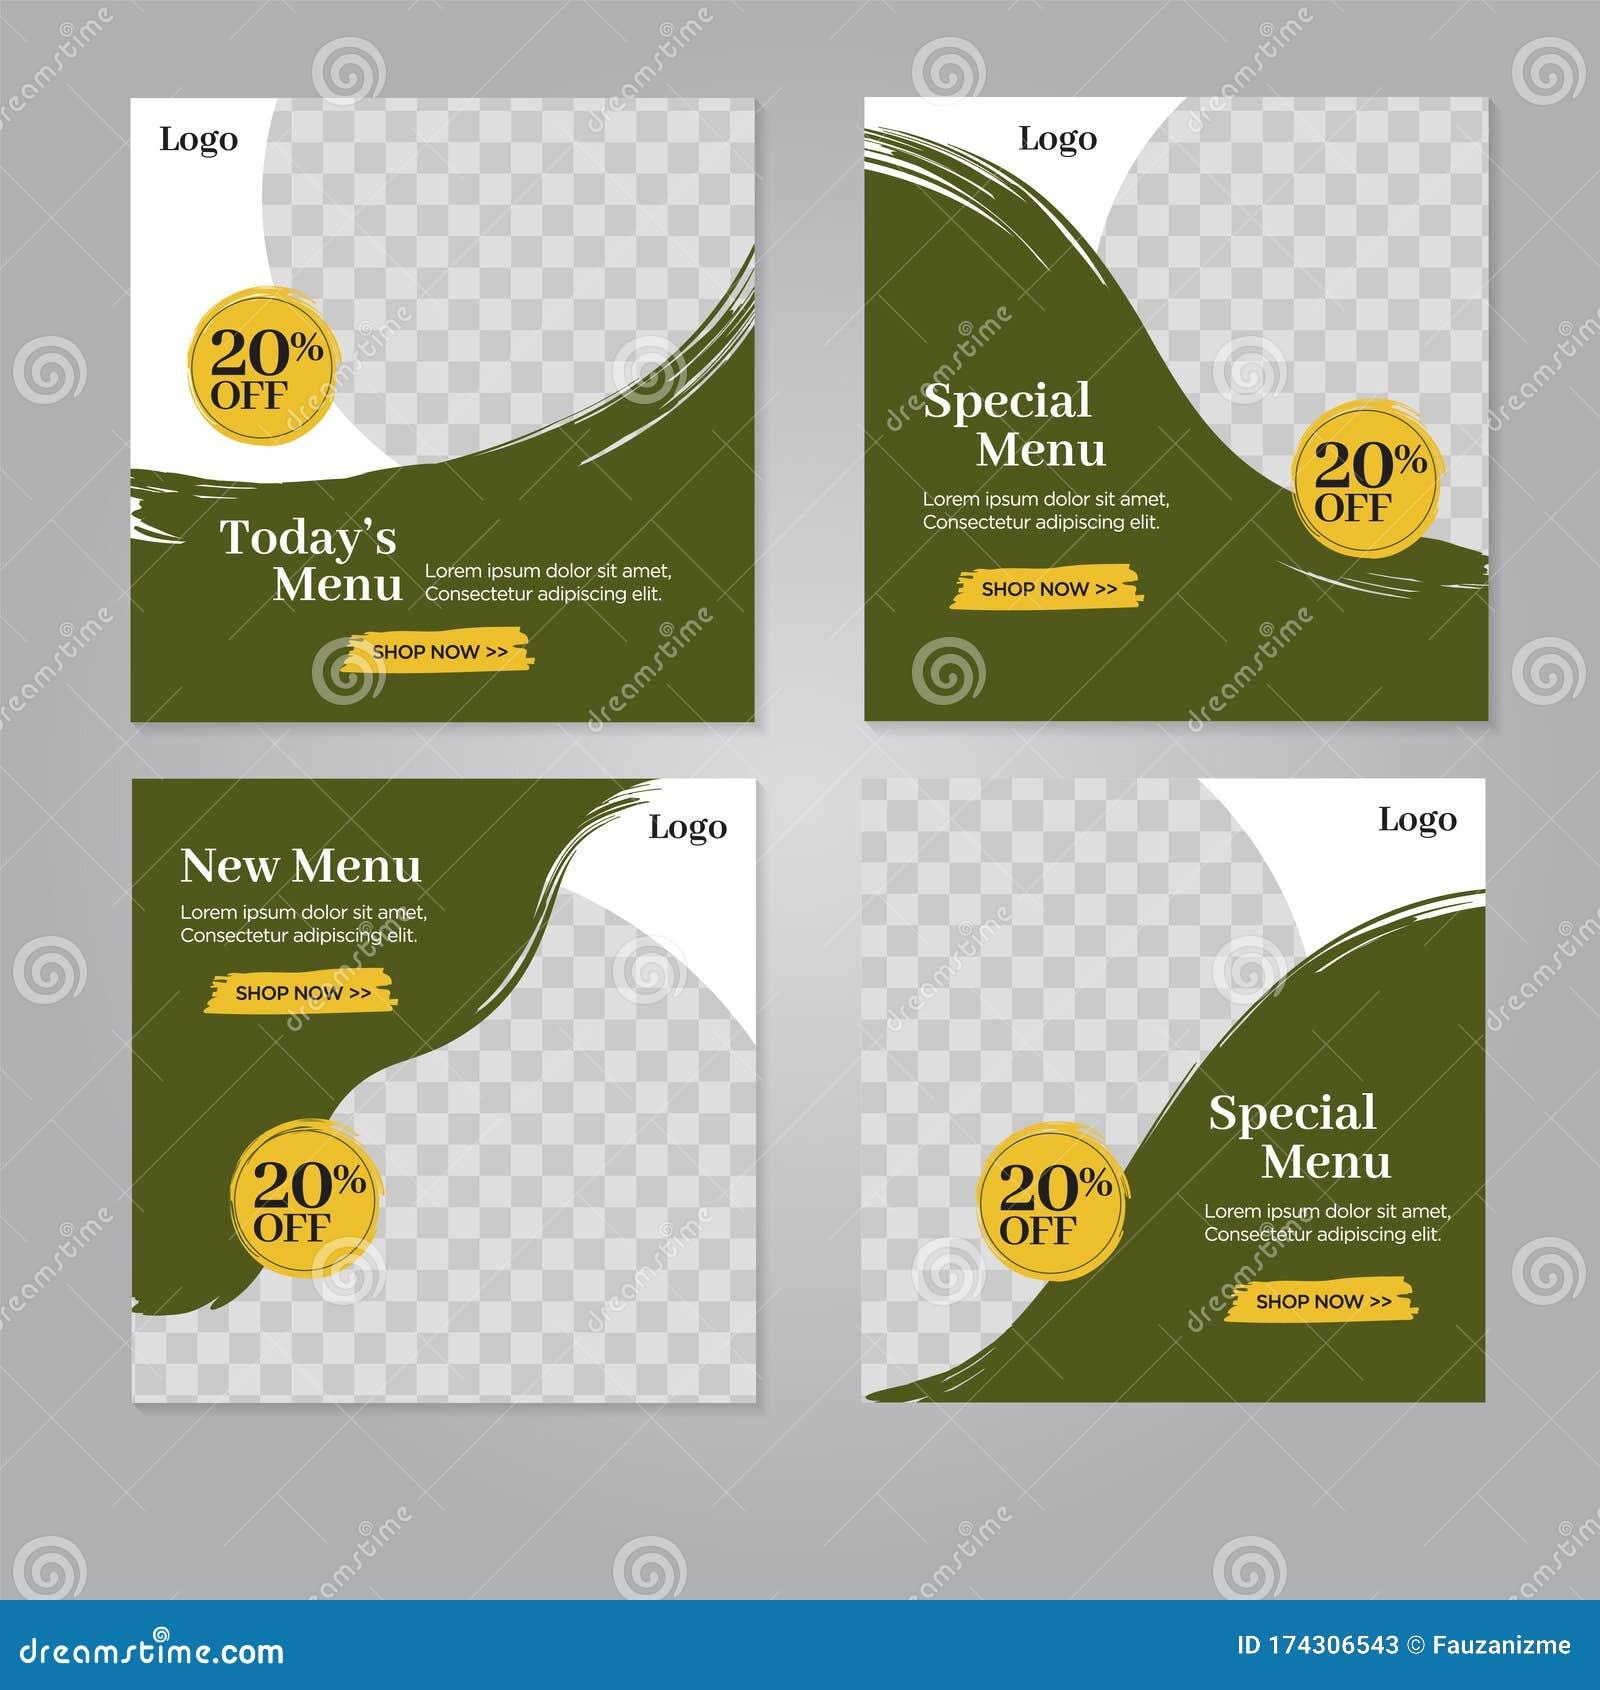 Restaurant Food Social Media Banner Post Design Template Stock Vector Illustration Of Poster Banner 174306543